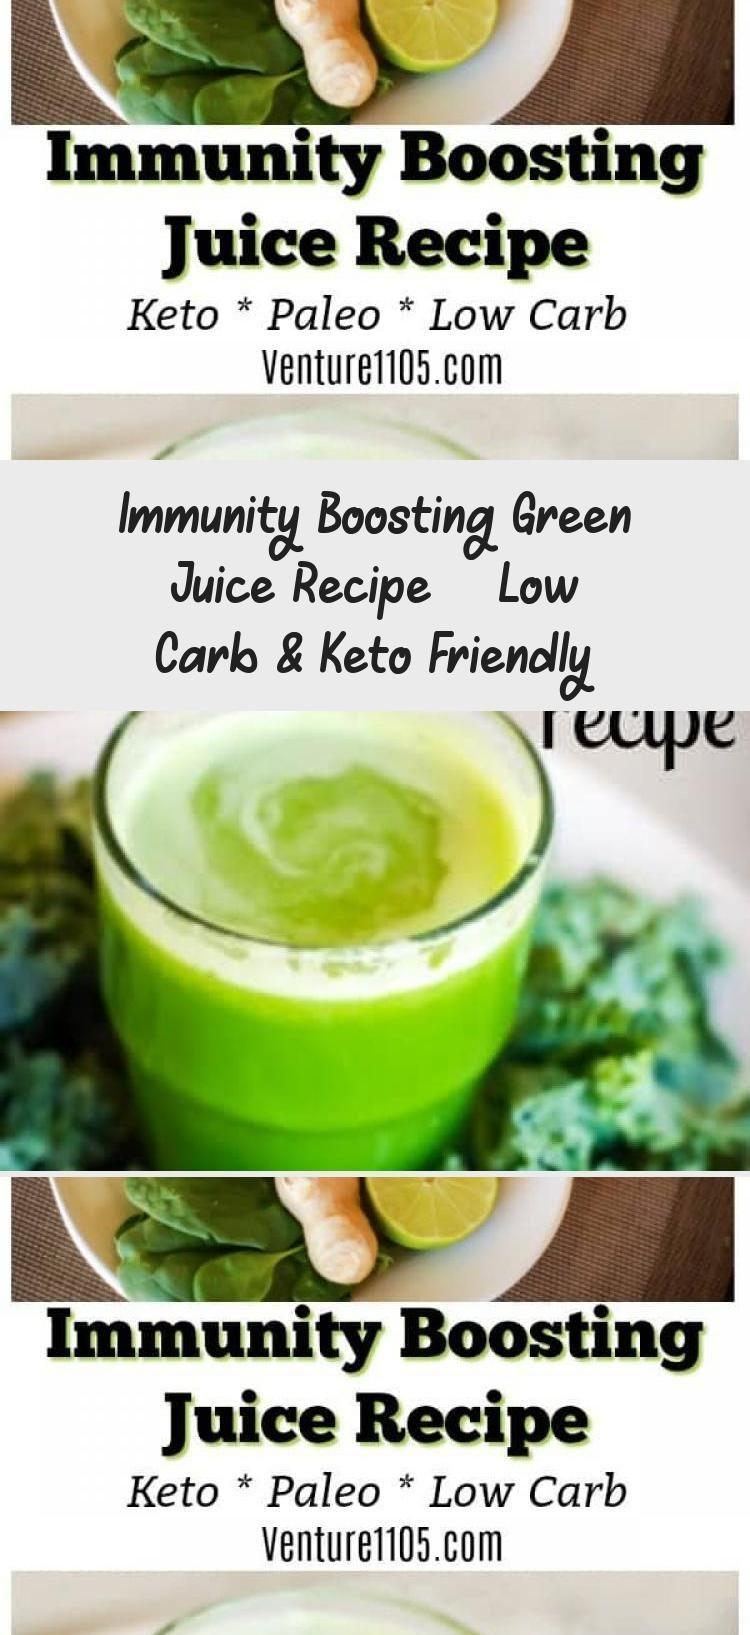 Beer Green Juice Keto Green Juice Pineapple Green Juice Green Juice Recipes For Beginners Green In 2020 Green Juice Recipes Juicing Recipes Fruit Juice Recipes